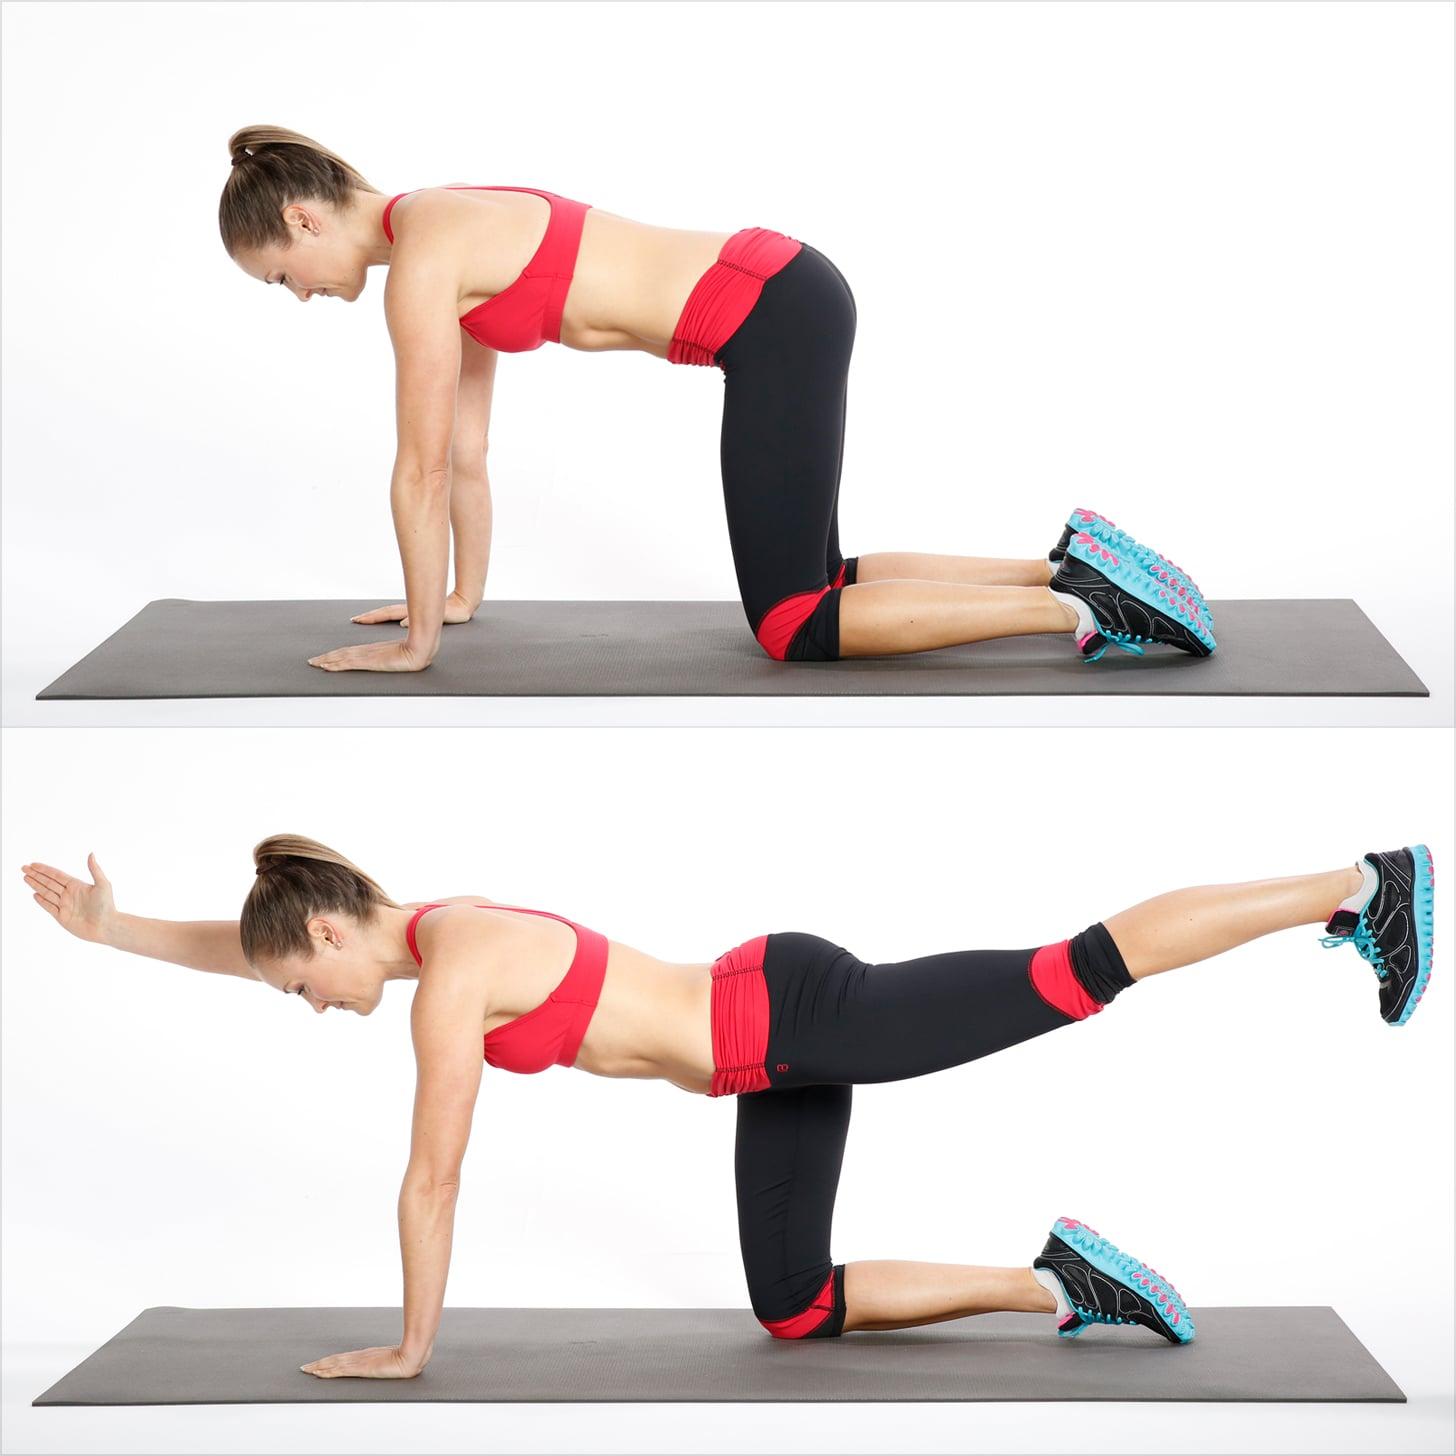 Birdog - Core exercises at home